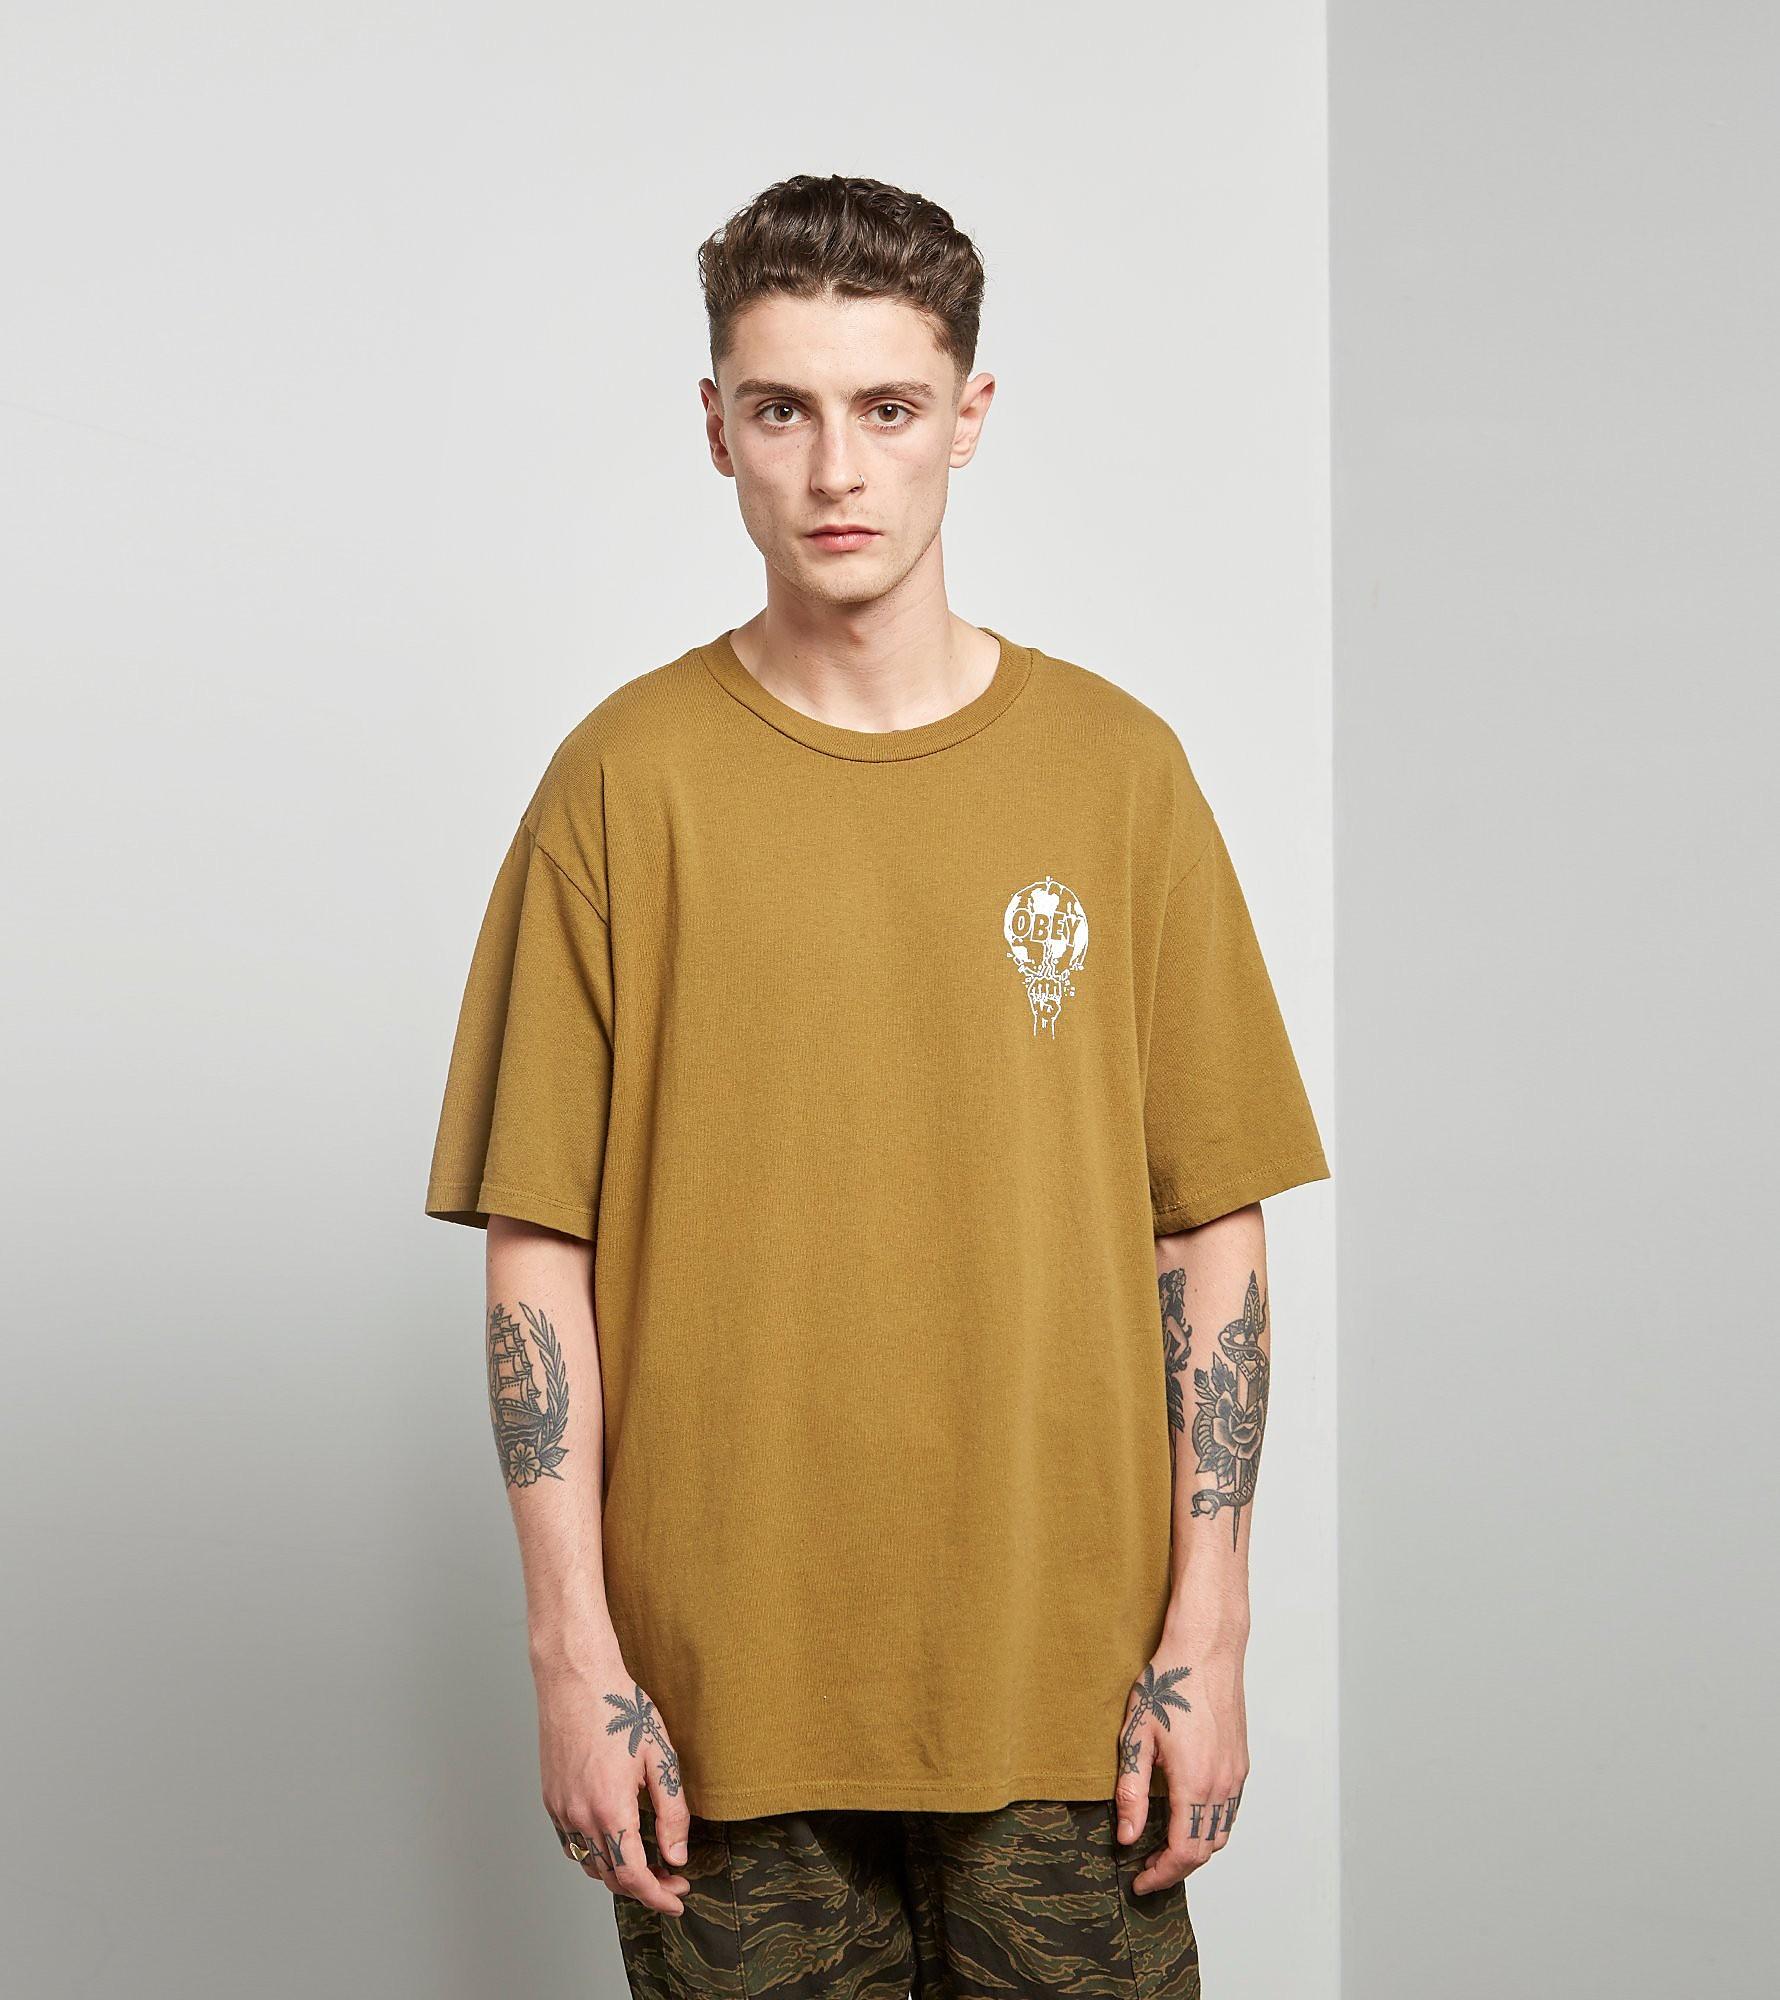 Obey Smash It Up T-Shirt